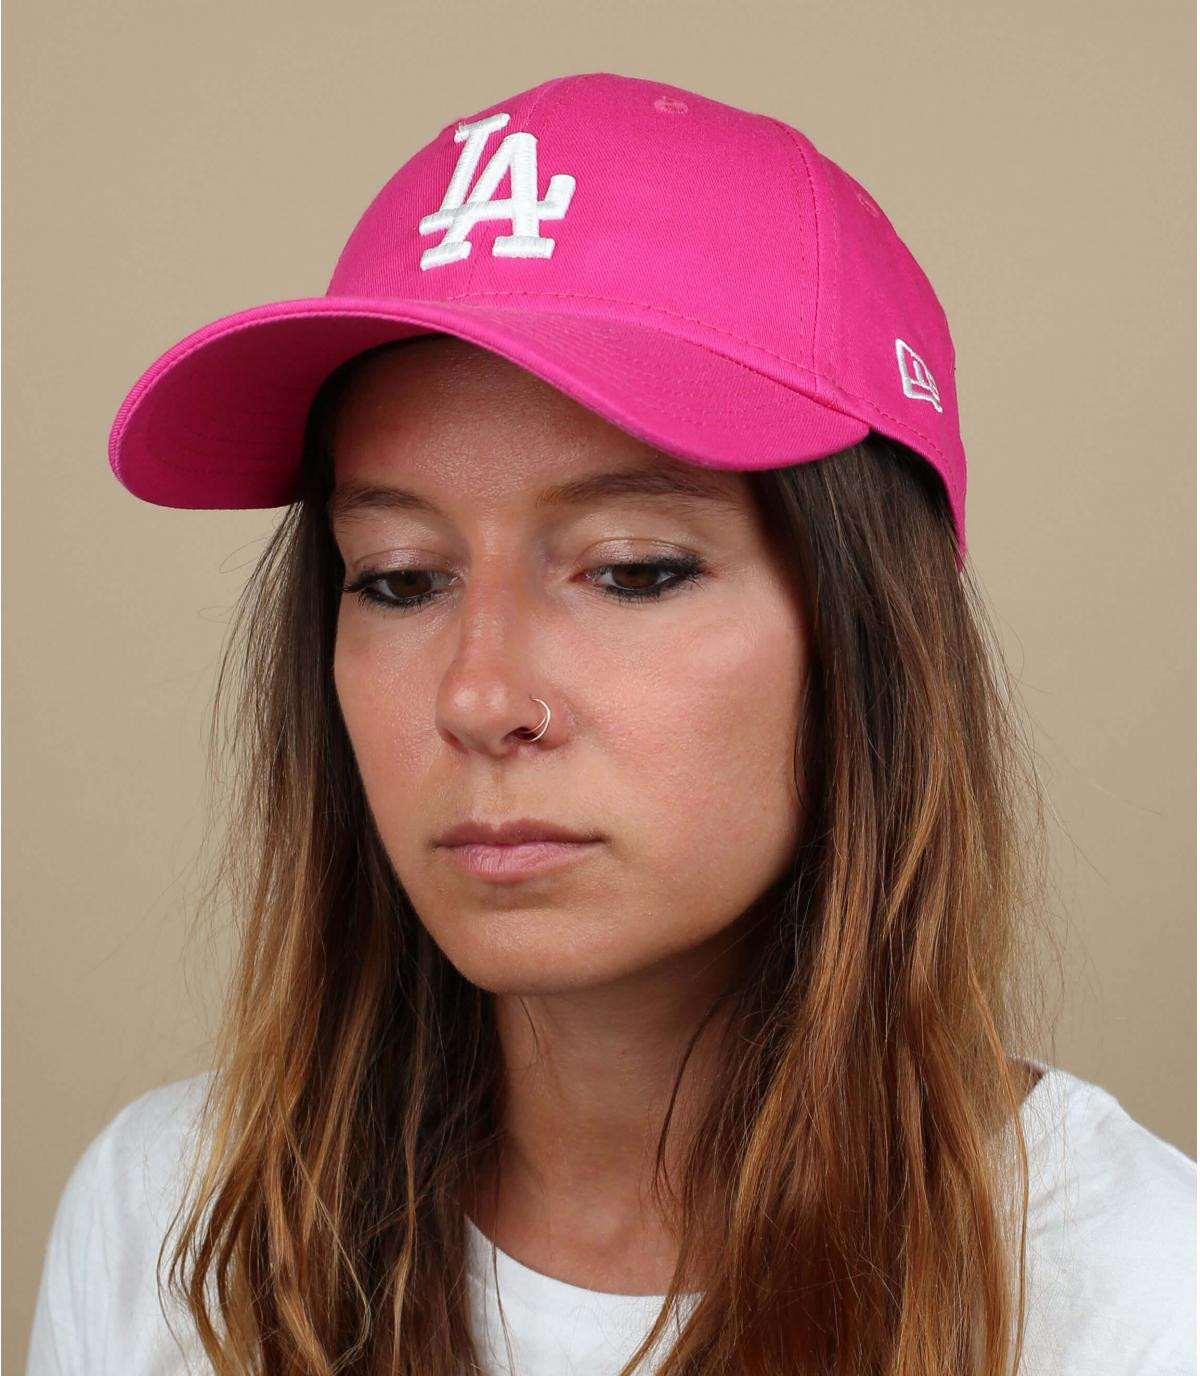 women LA cap pink